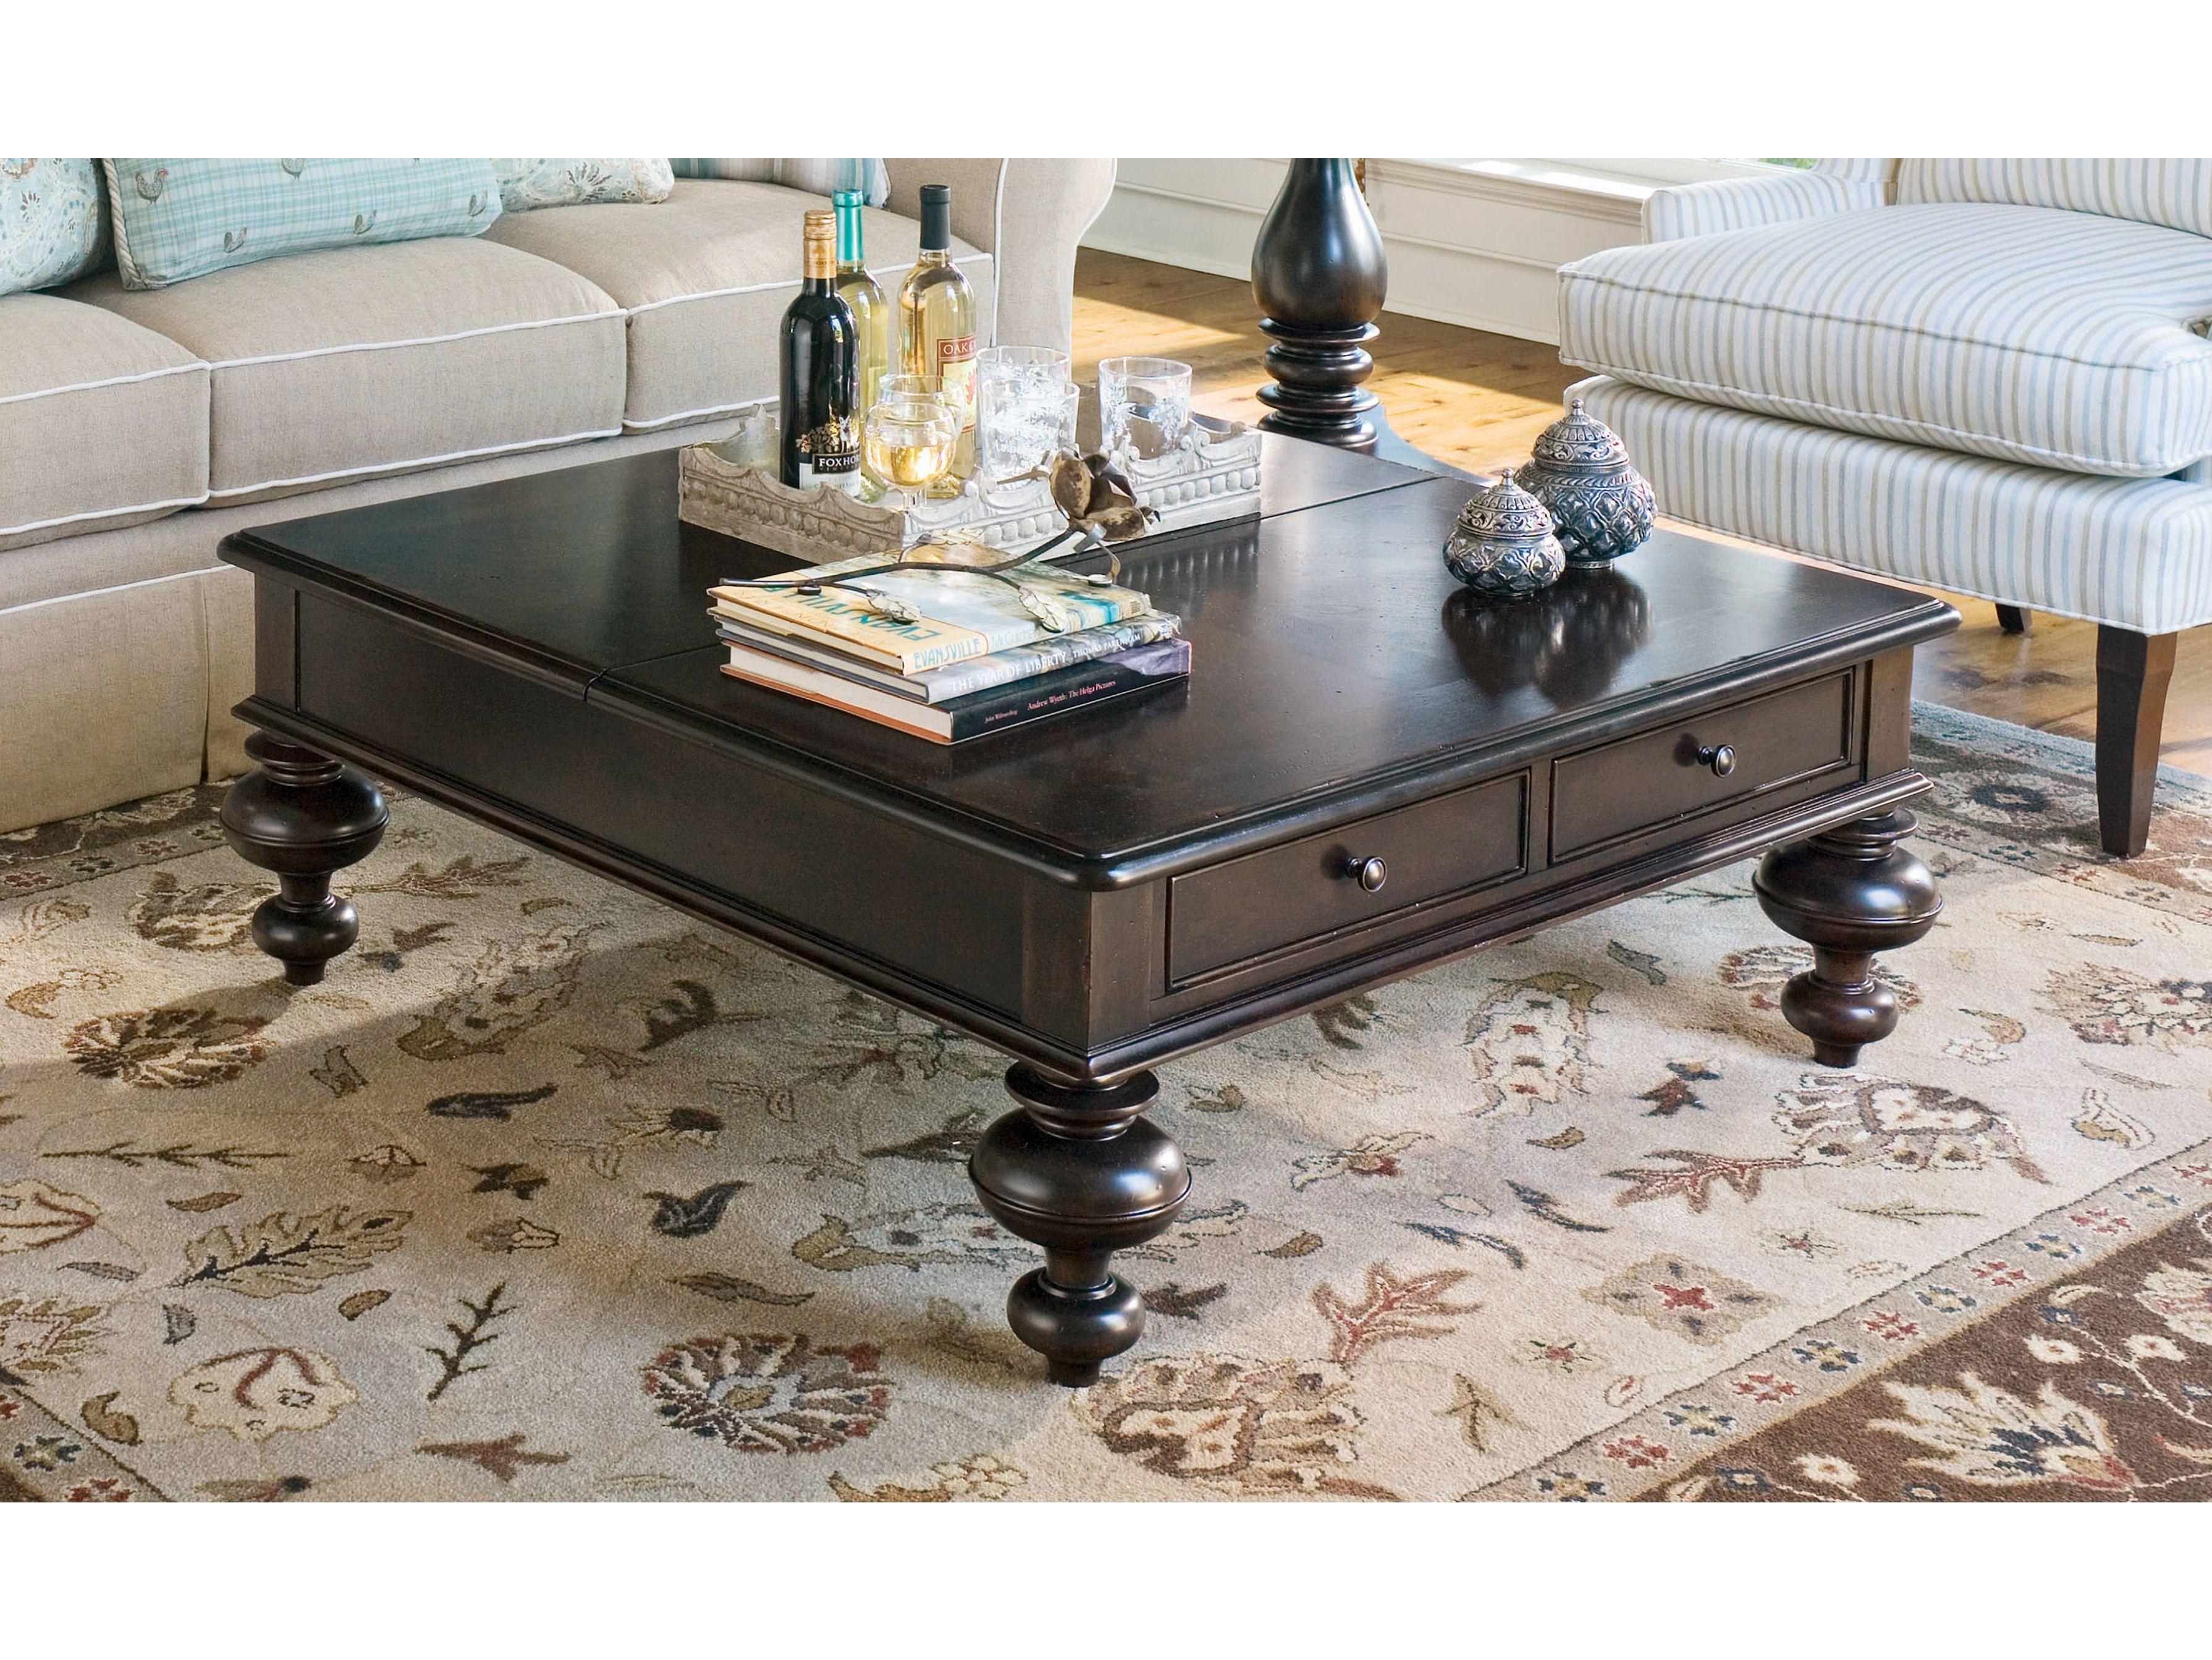 Luxury Home Decor Shopping For Indoor Outdoor Coffee Table Farmhouse Coffee Table Coffee Table With Storage [ 2686 x 3580 Pixel ]